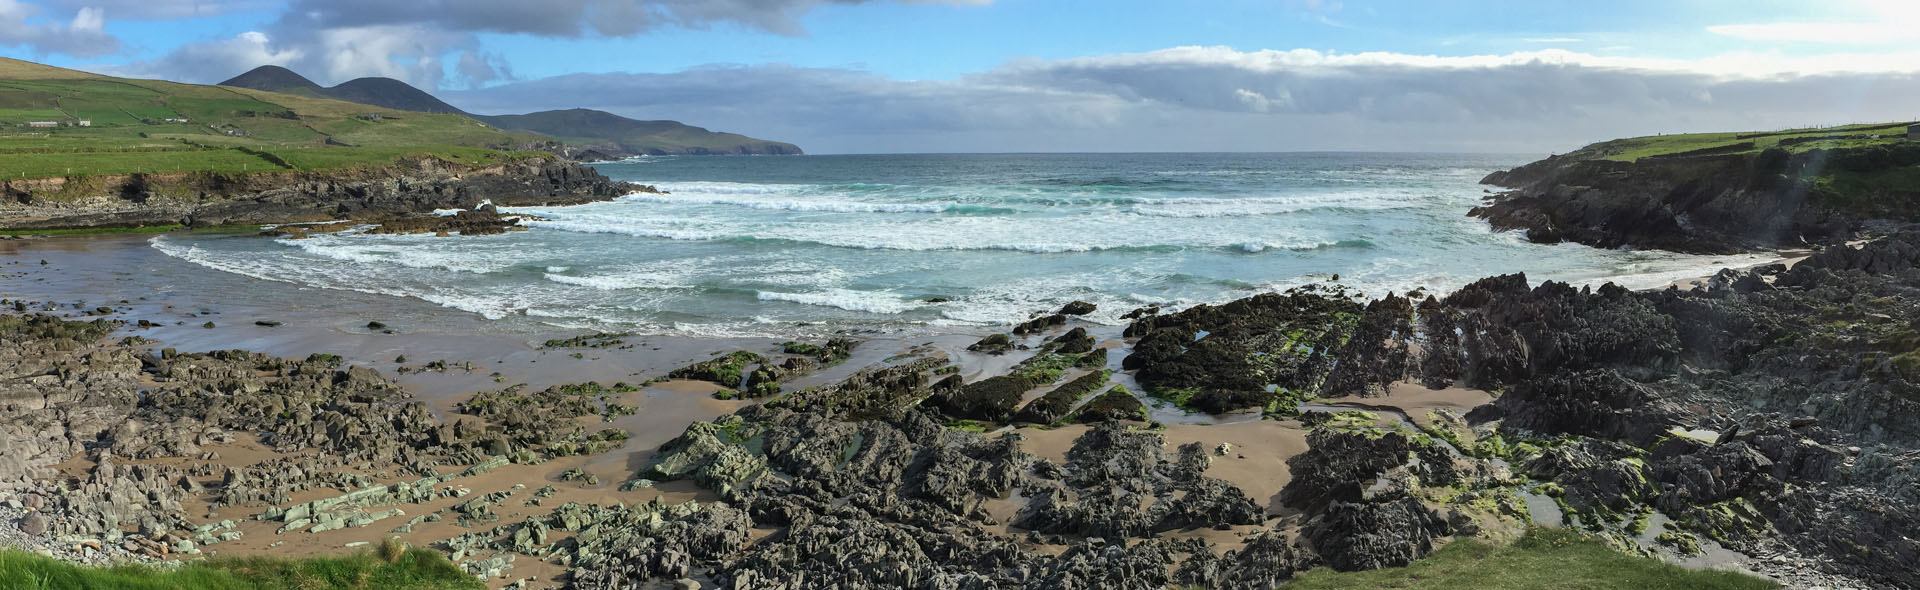 Der Skelligs Ring in Irland